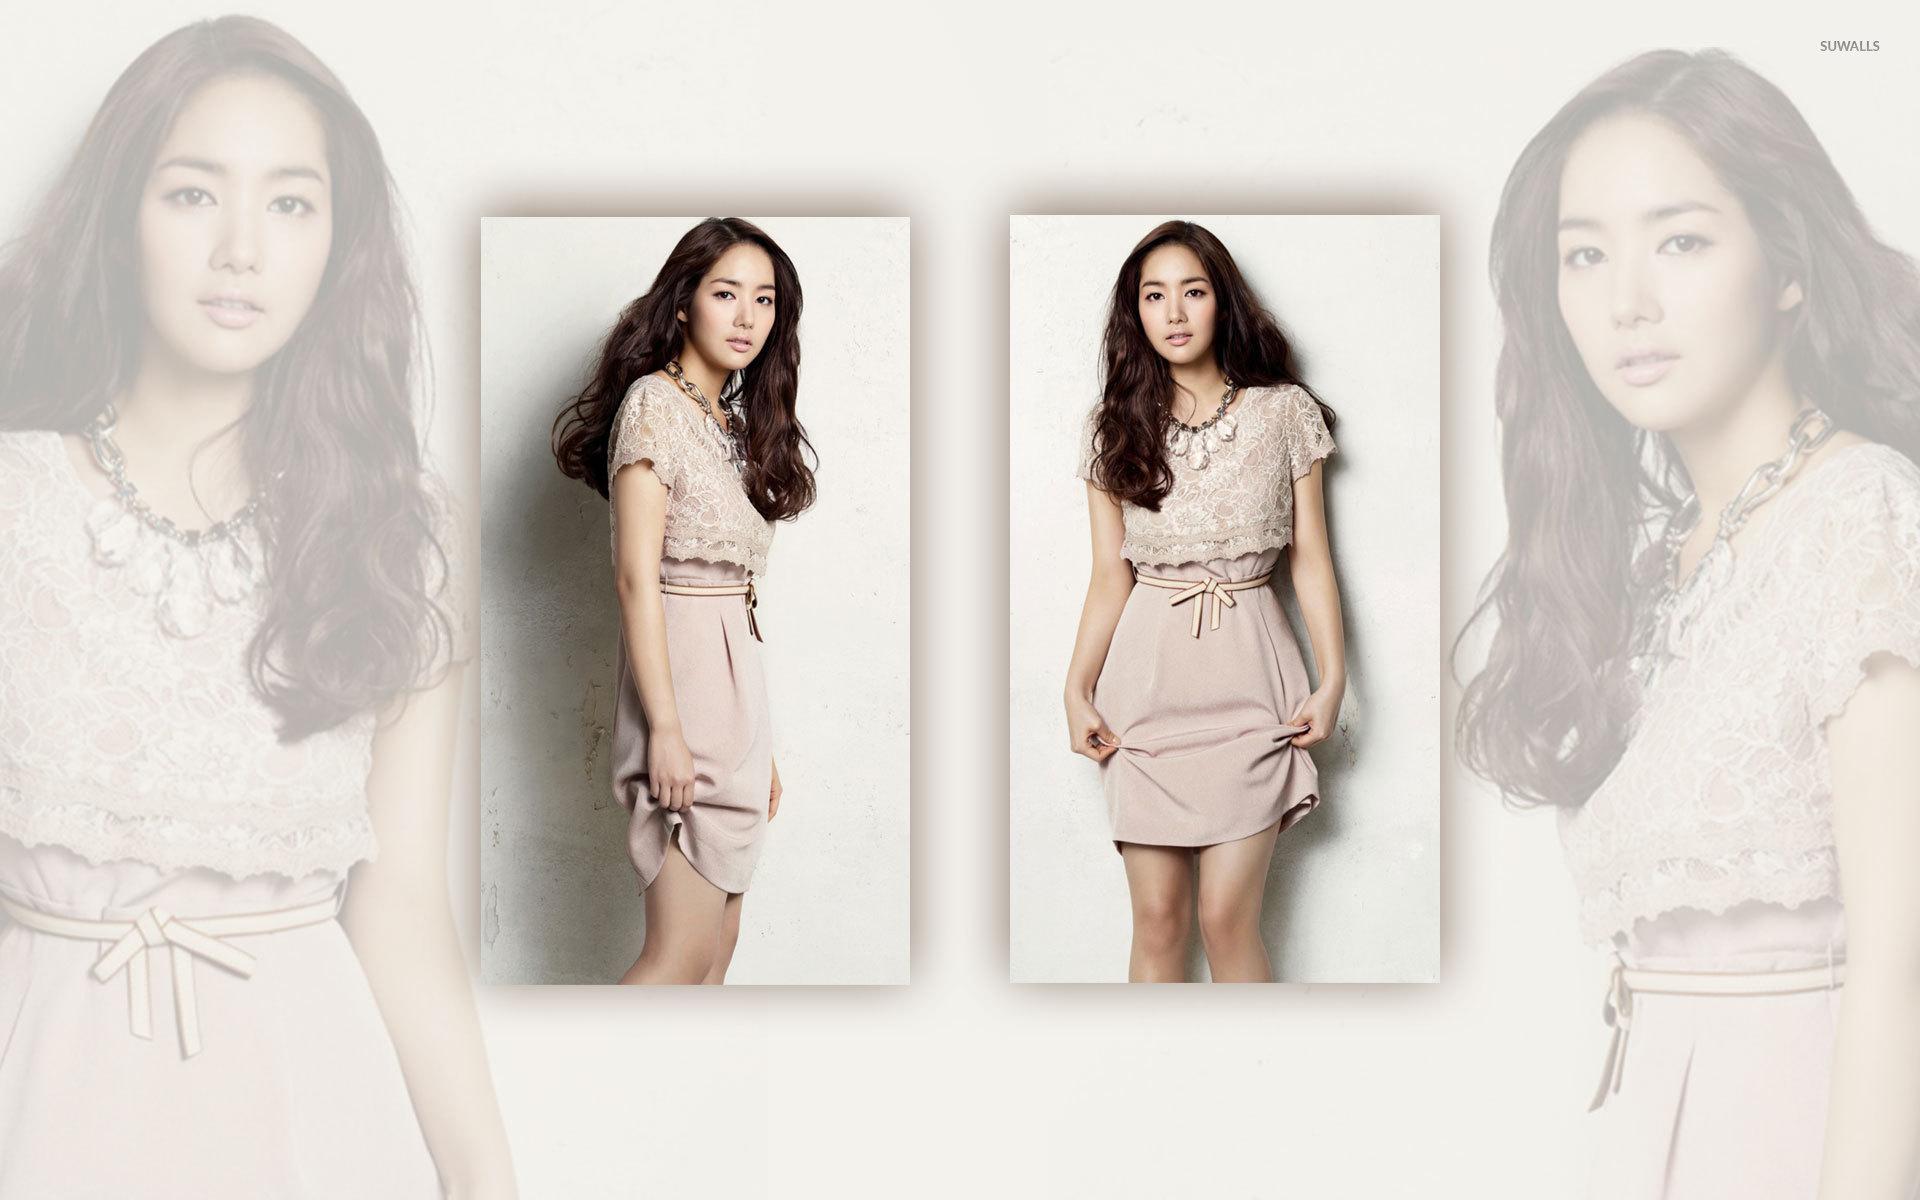 park minyoung in a kaki dress wallpaper celebrity